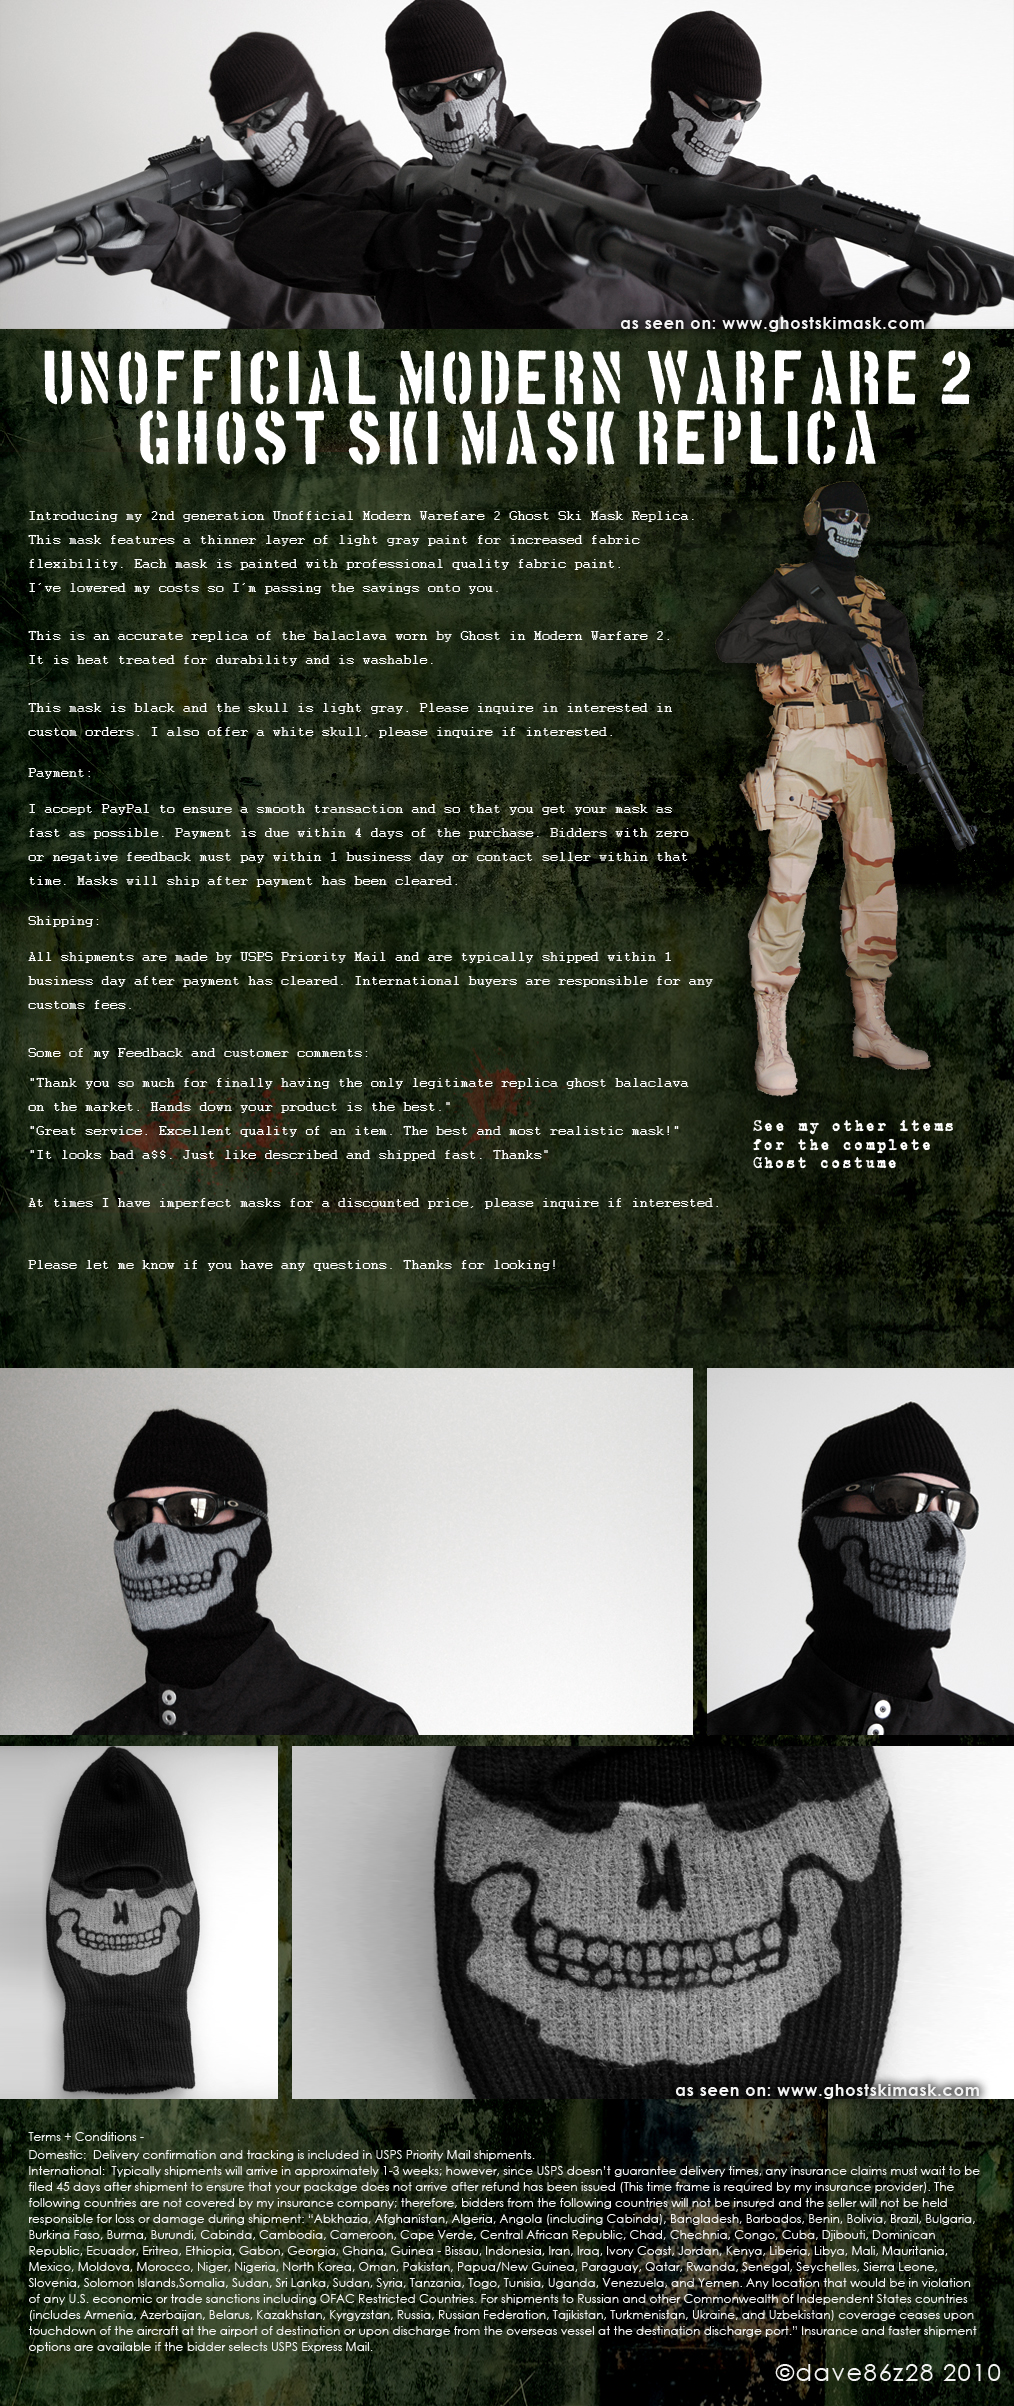 Unofficial Modern Warfare 2 Ghost Ski Mask Replica Wide Knit New